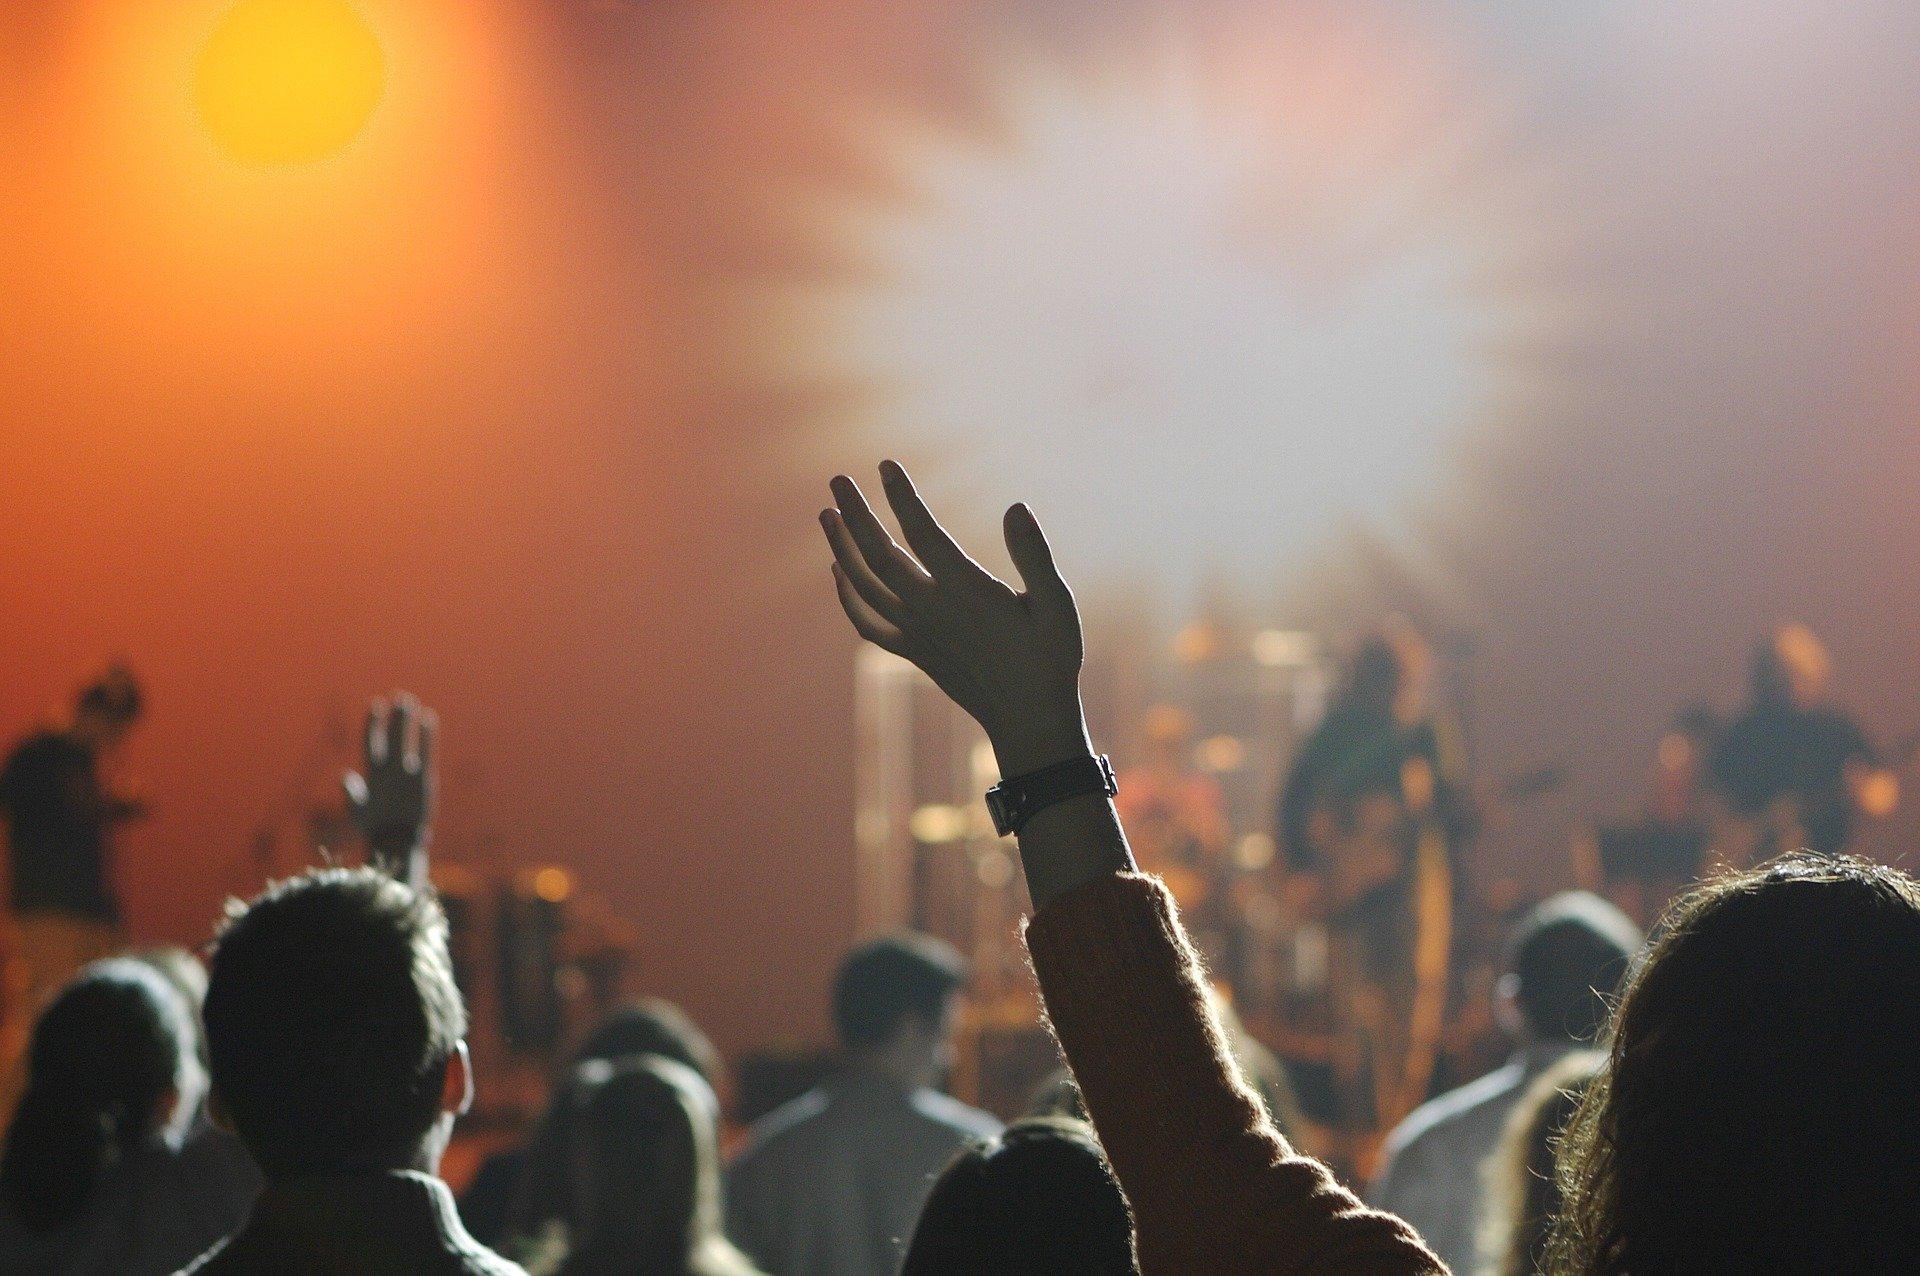 crowd worshipping God